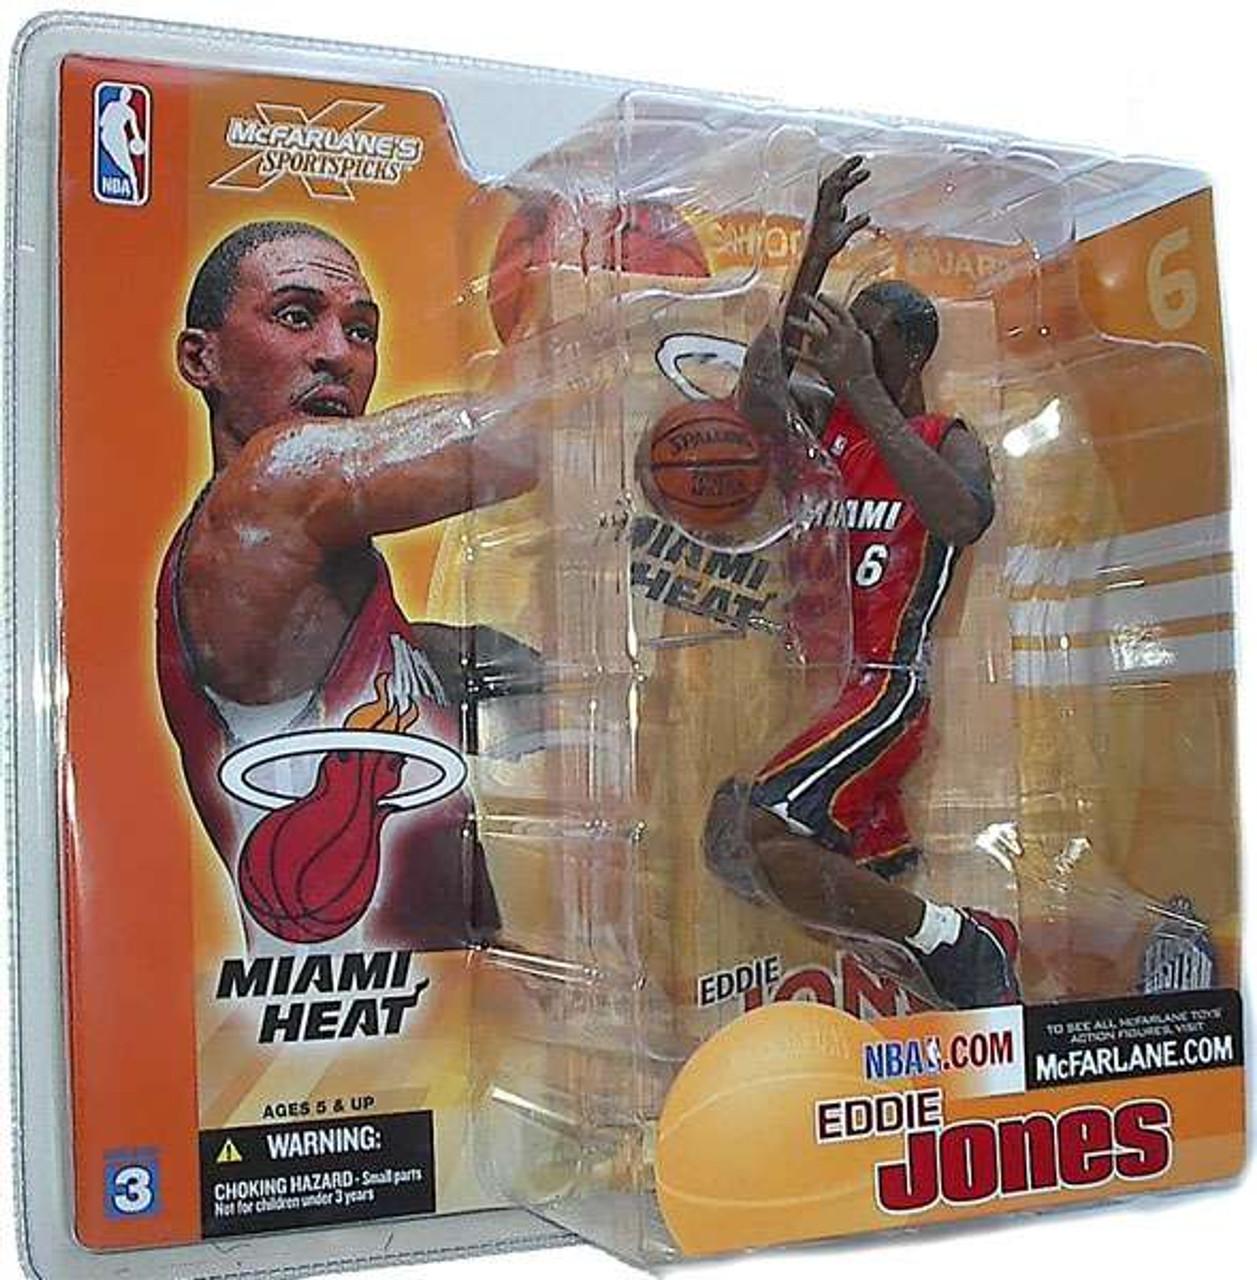 McFarlane Toys NBA Miami Heat Sports Picks Series 3 Eddie Jones Action Figure [Red Jersey]